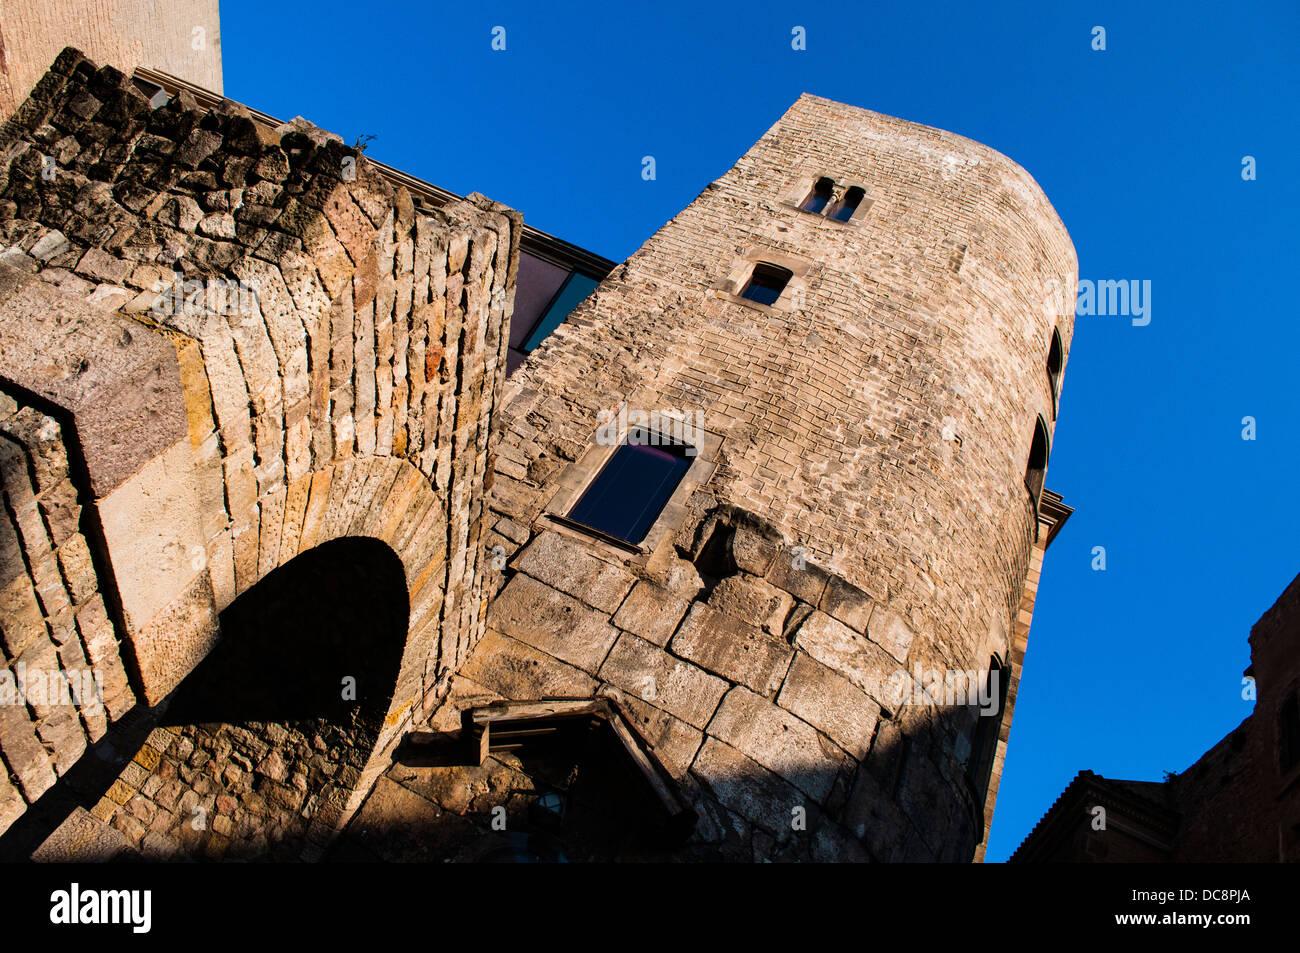 Acueducto Acueducto Romano, Barcelona, Cataluña, España - Stock Image